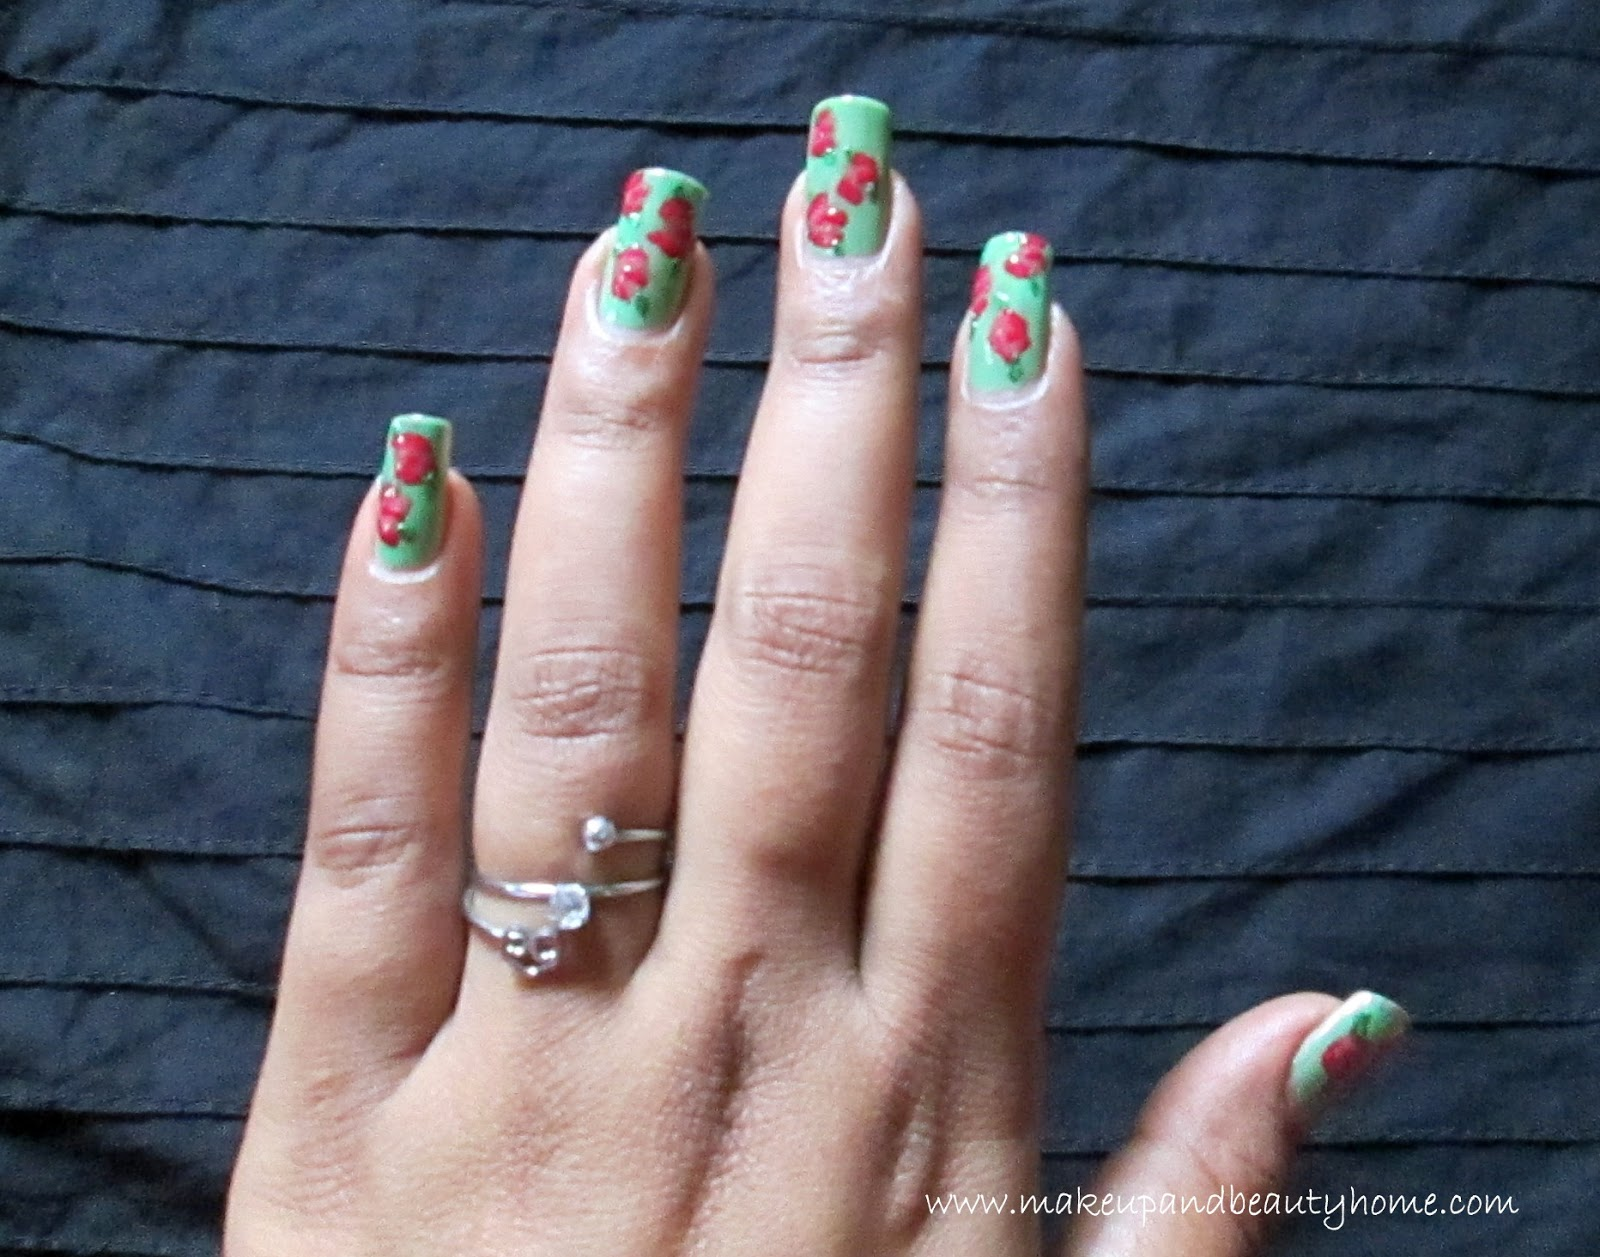 Do It Yourself Art: Vintage Rose Print Nail Art Tutorial